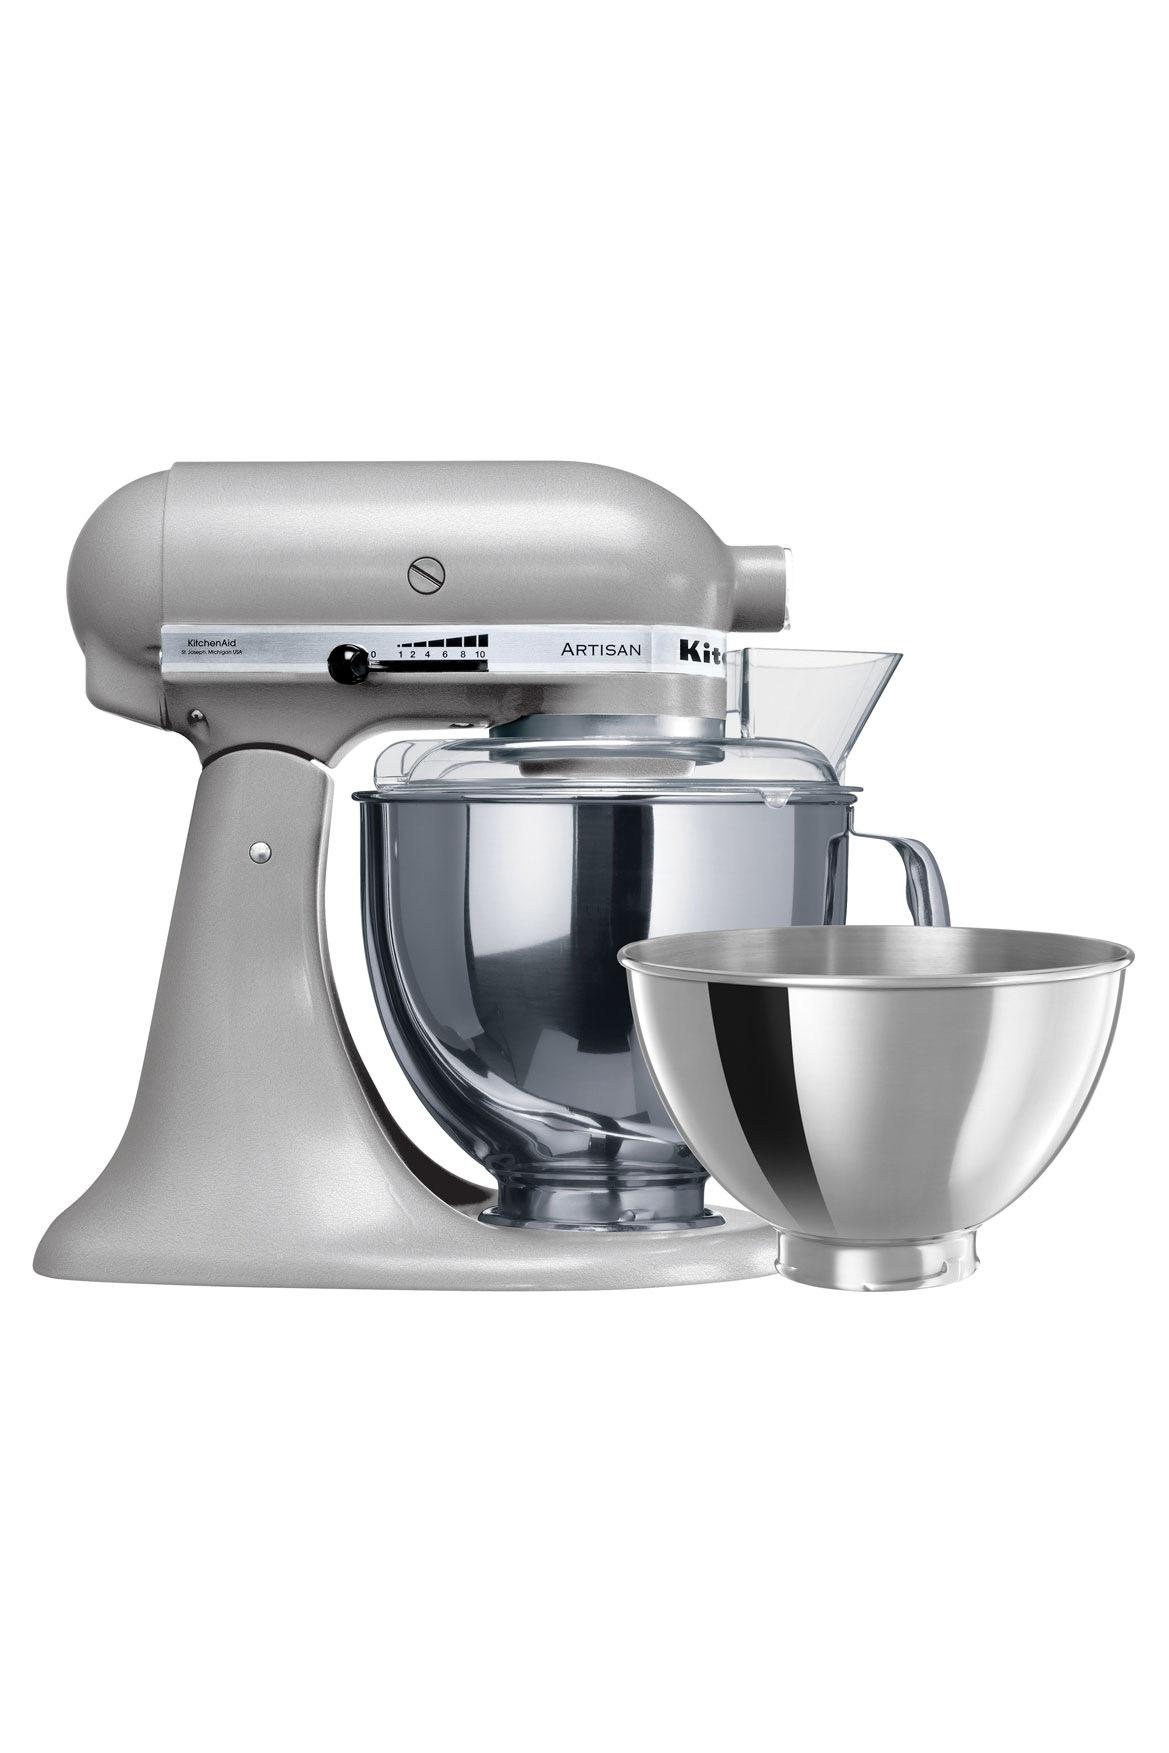 Uncategorized Myer Kitchen Appliances kitchenaid ksm160 artisan mixer silver 5ksm160psacu myer online